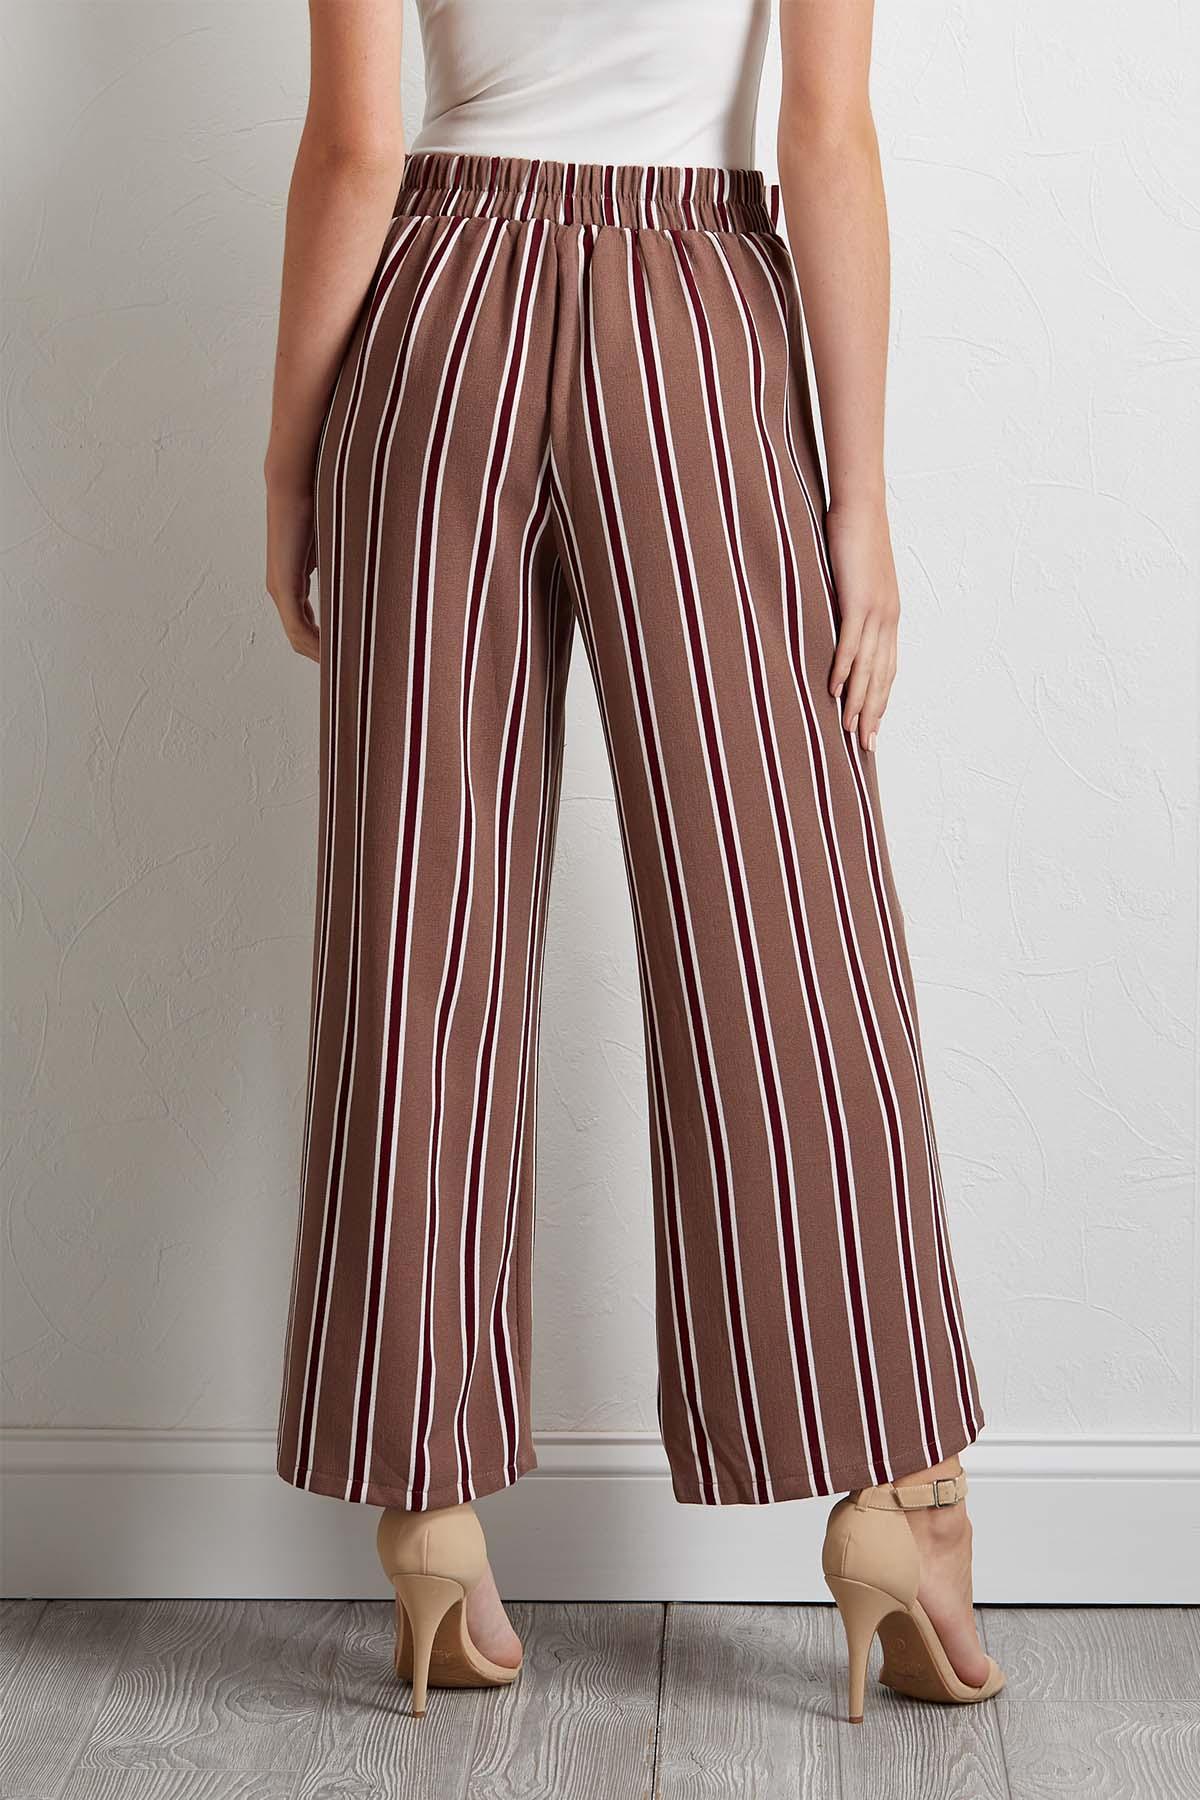 Stripe Tie Front Ankle Pants